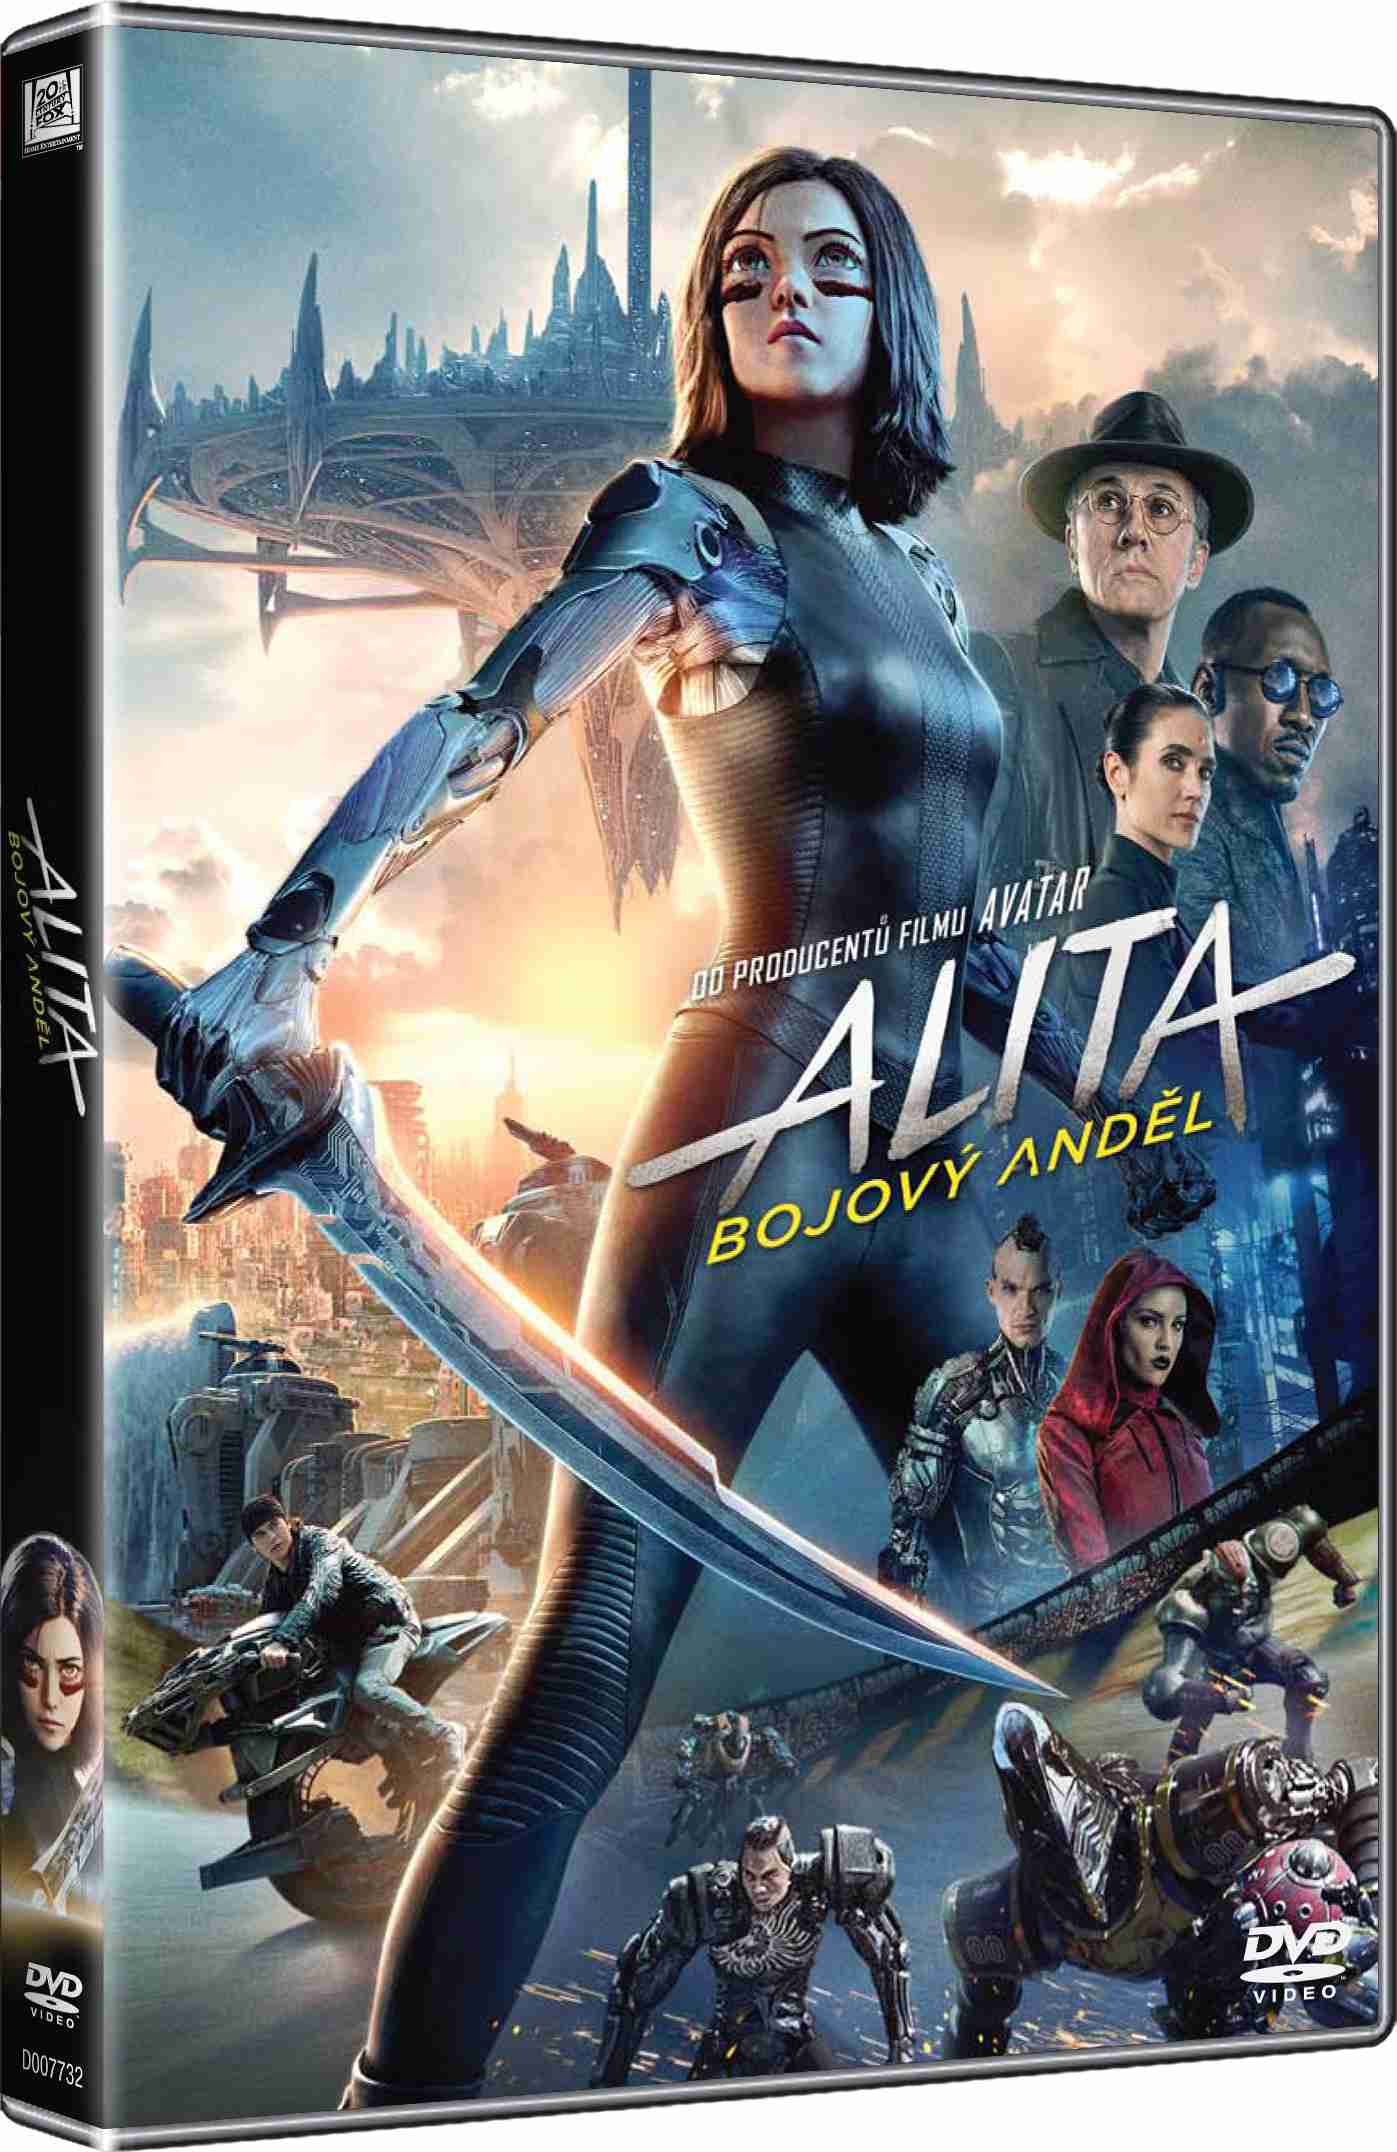 Alita: Bojový Anděl - DVD